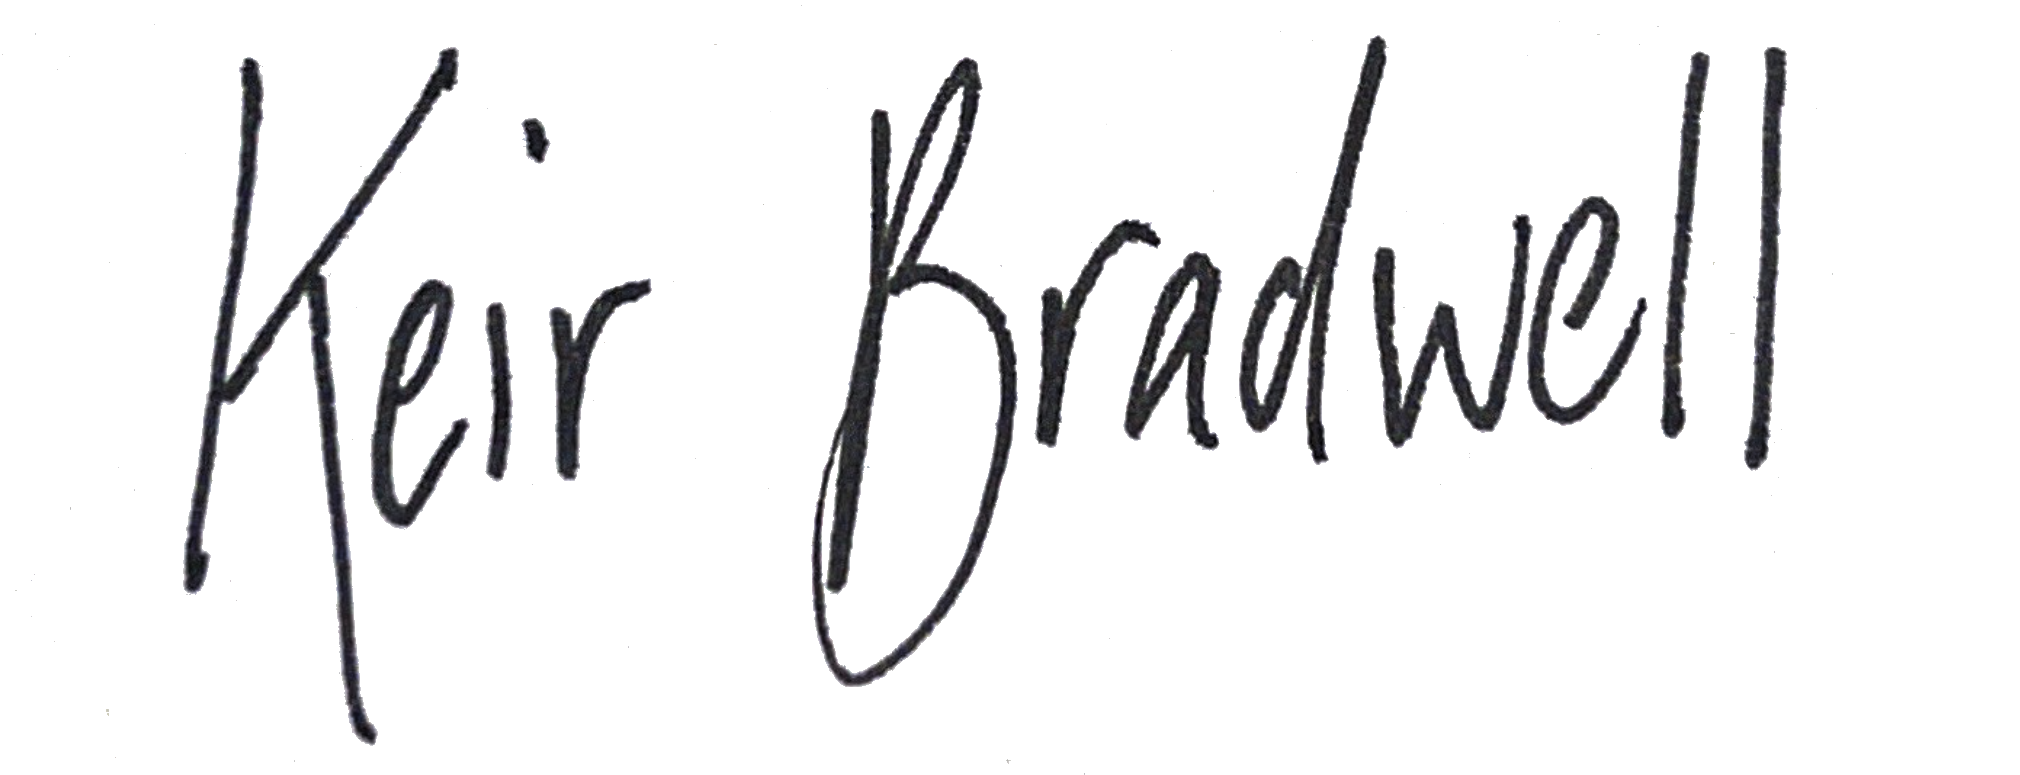 Keir Bradwell